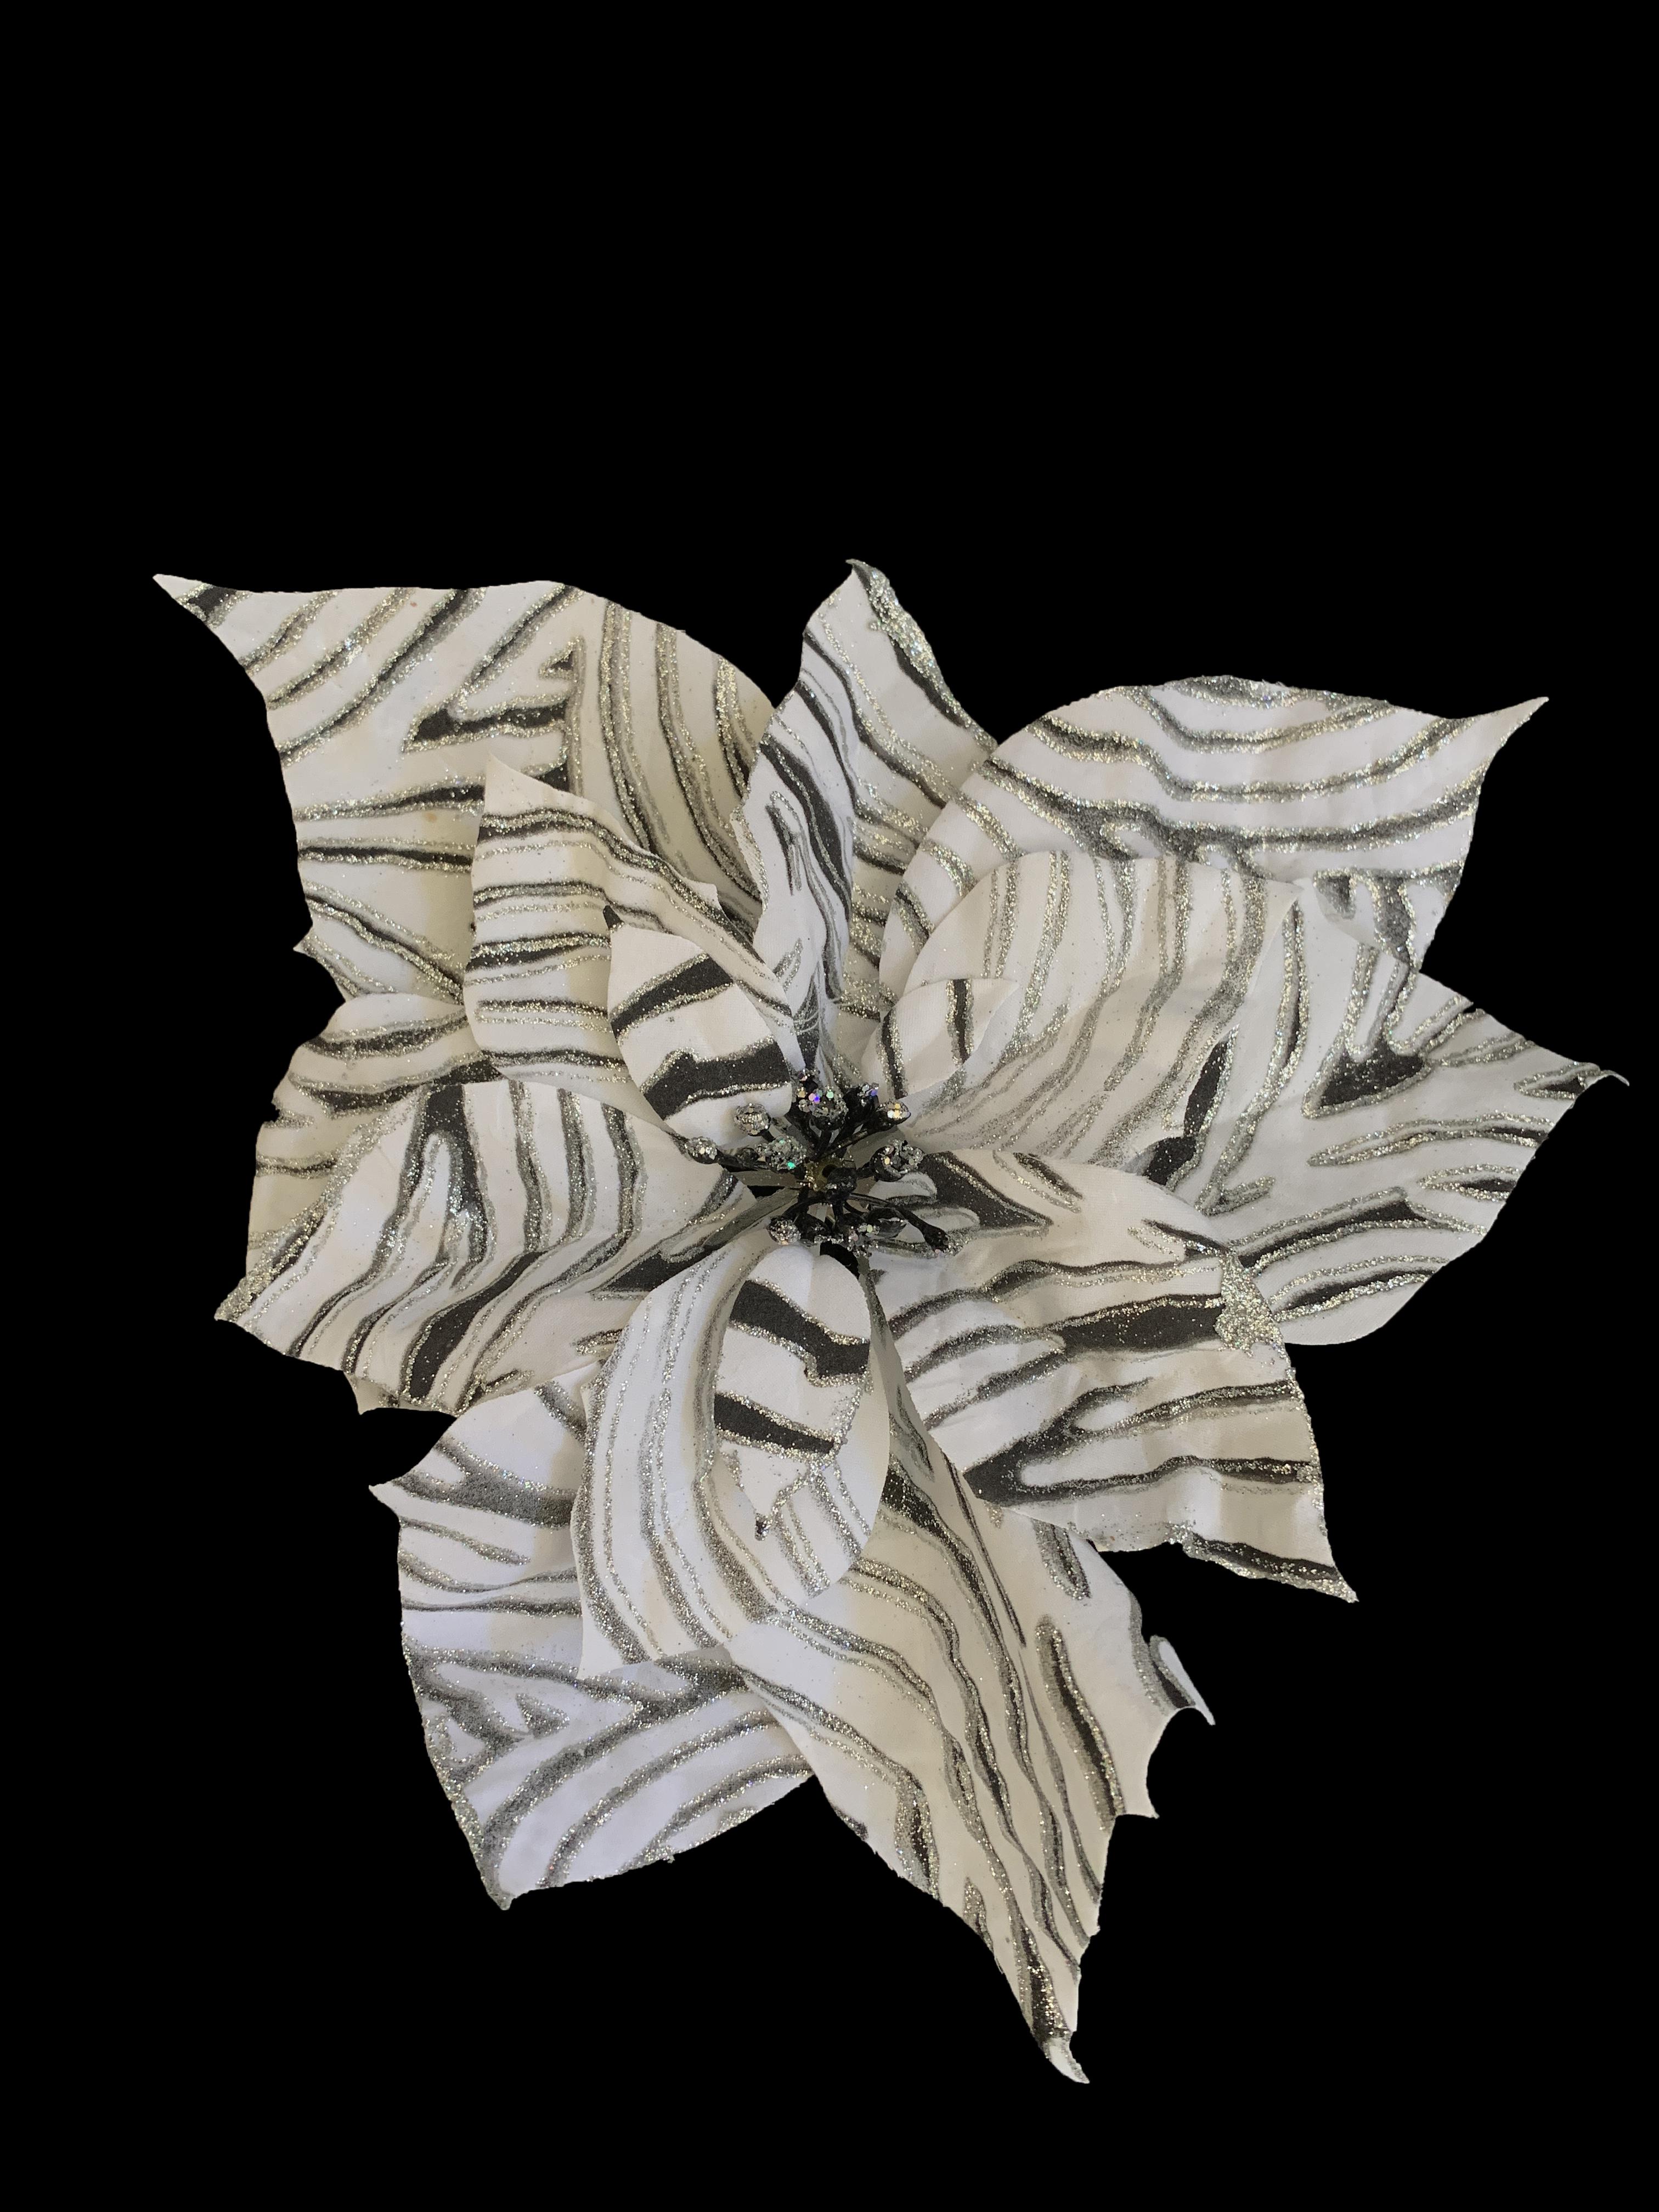 Clip on Zebra Patterned Poinsettia Ornament